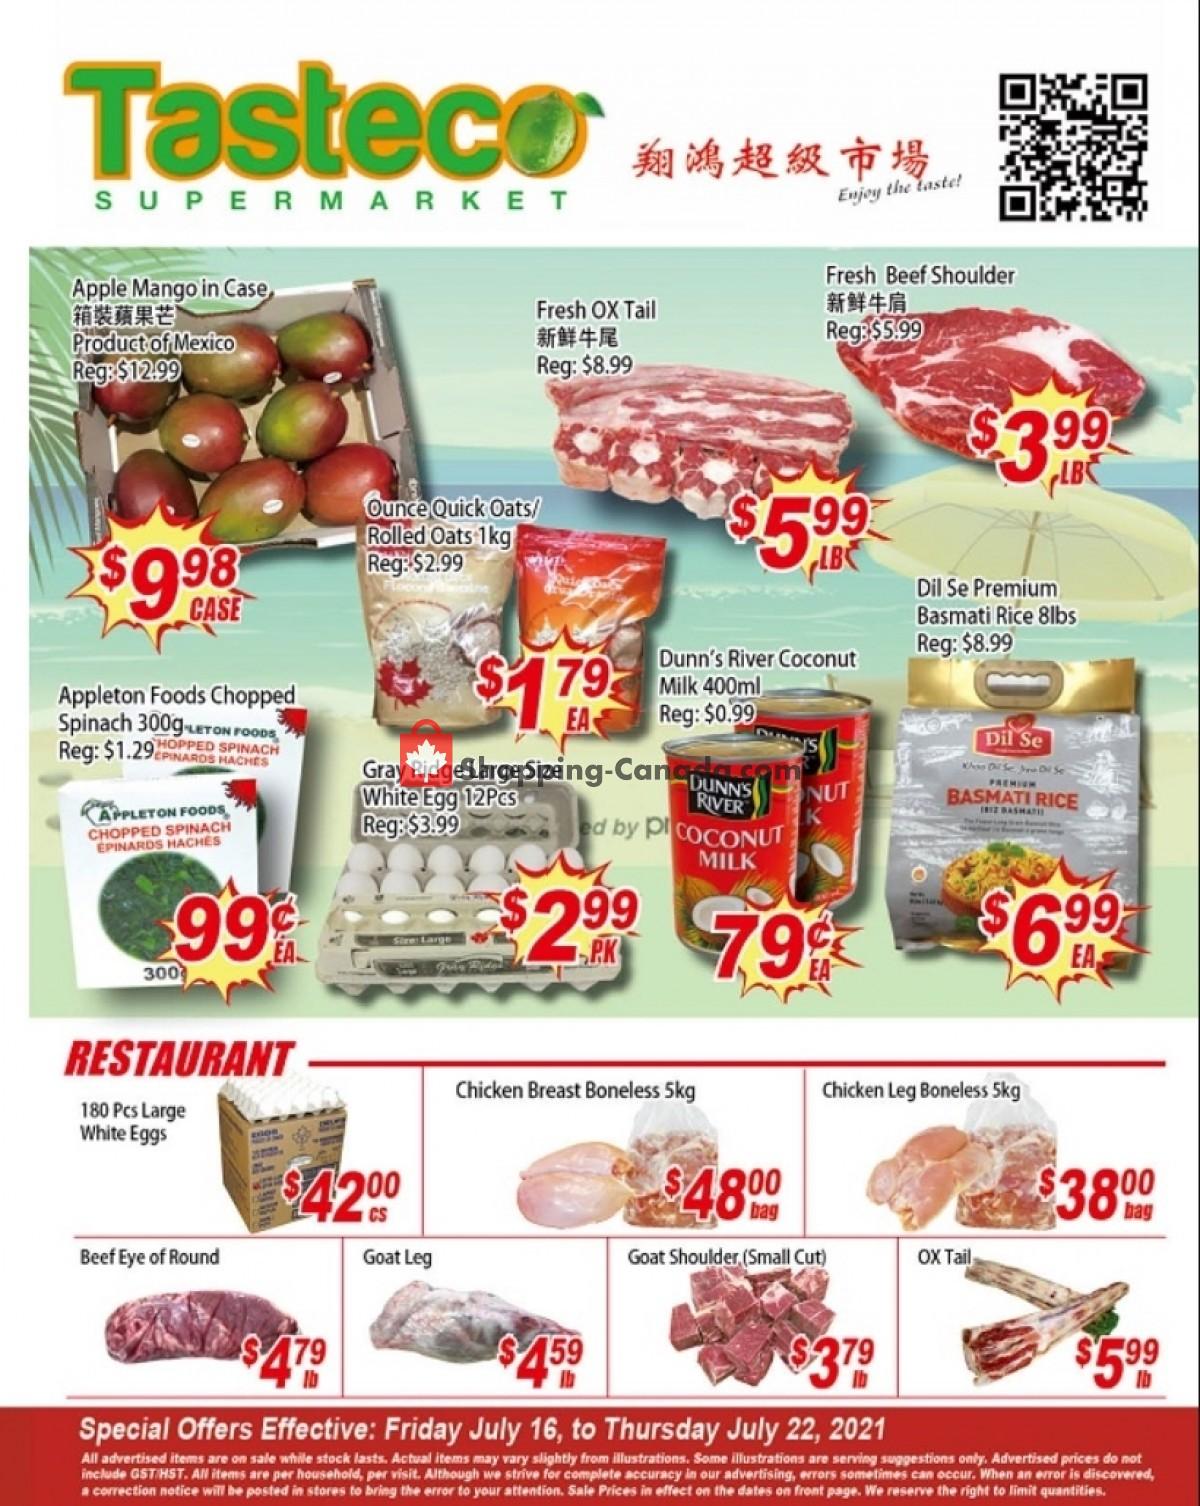 Flyer Tasteco Supermarket Canada - from Friday July 16, 2021 to Thursday July 22, 2021